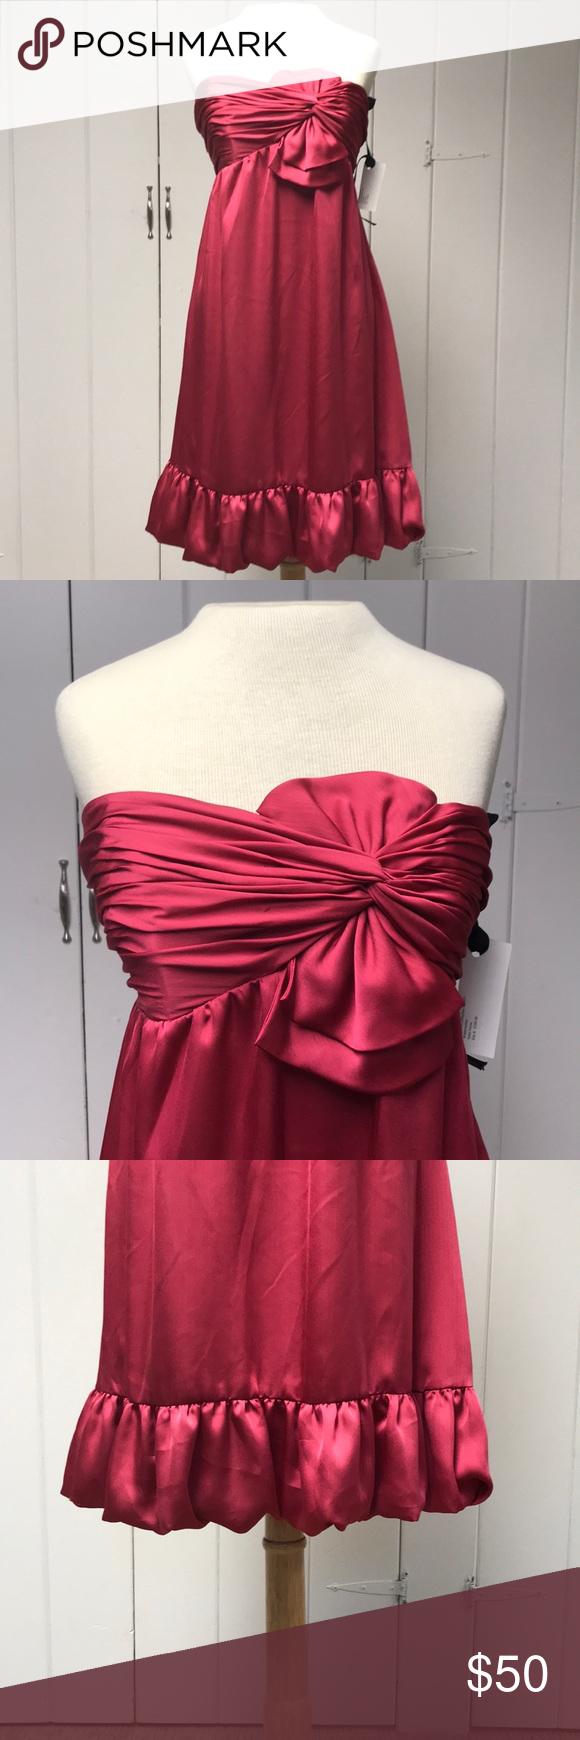 Wine red formal cocktail dress bridesmaid nwt my posh picks